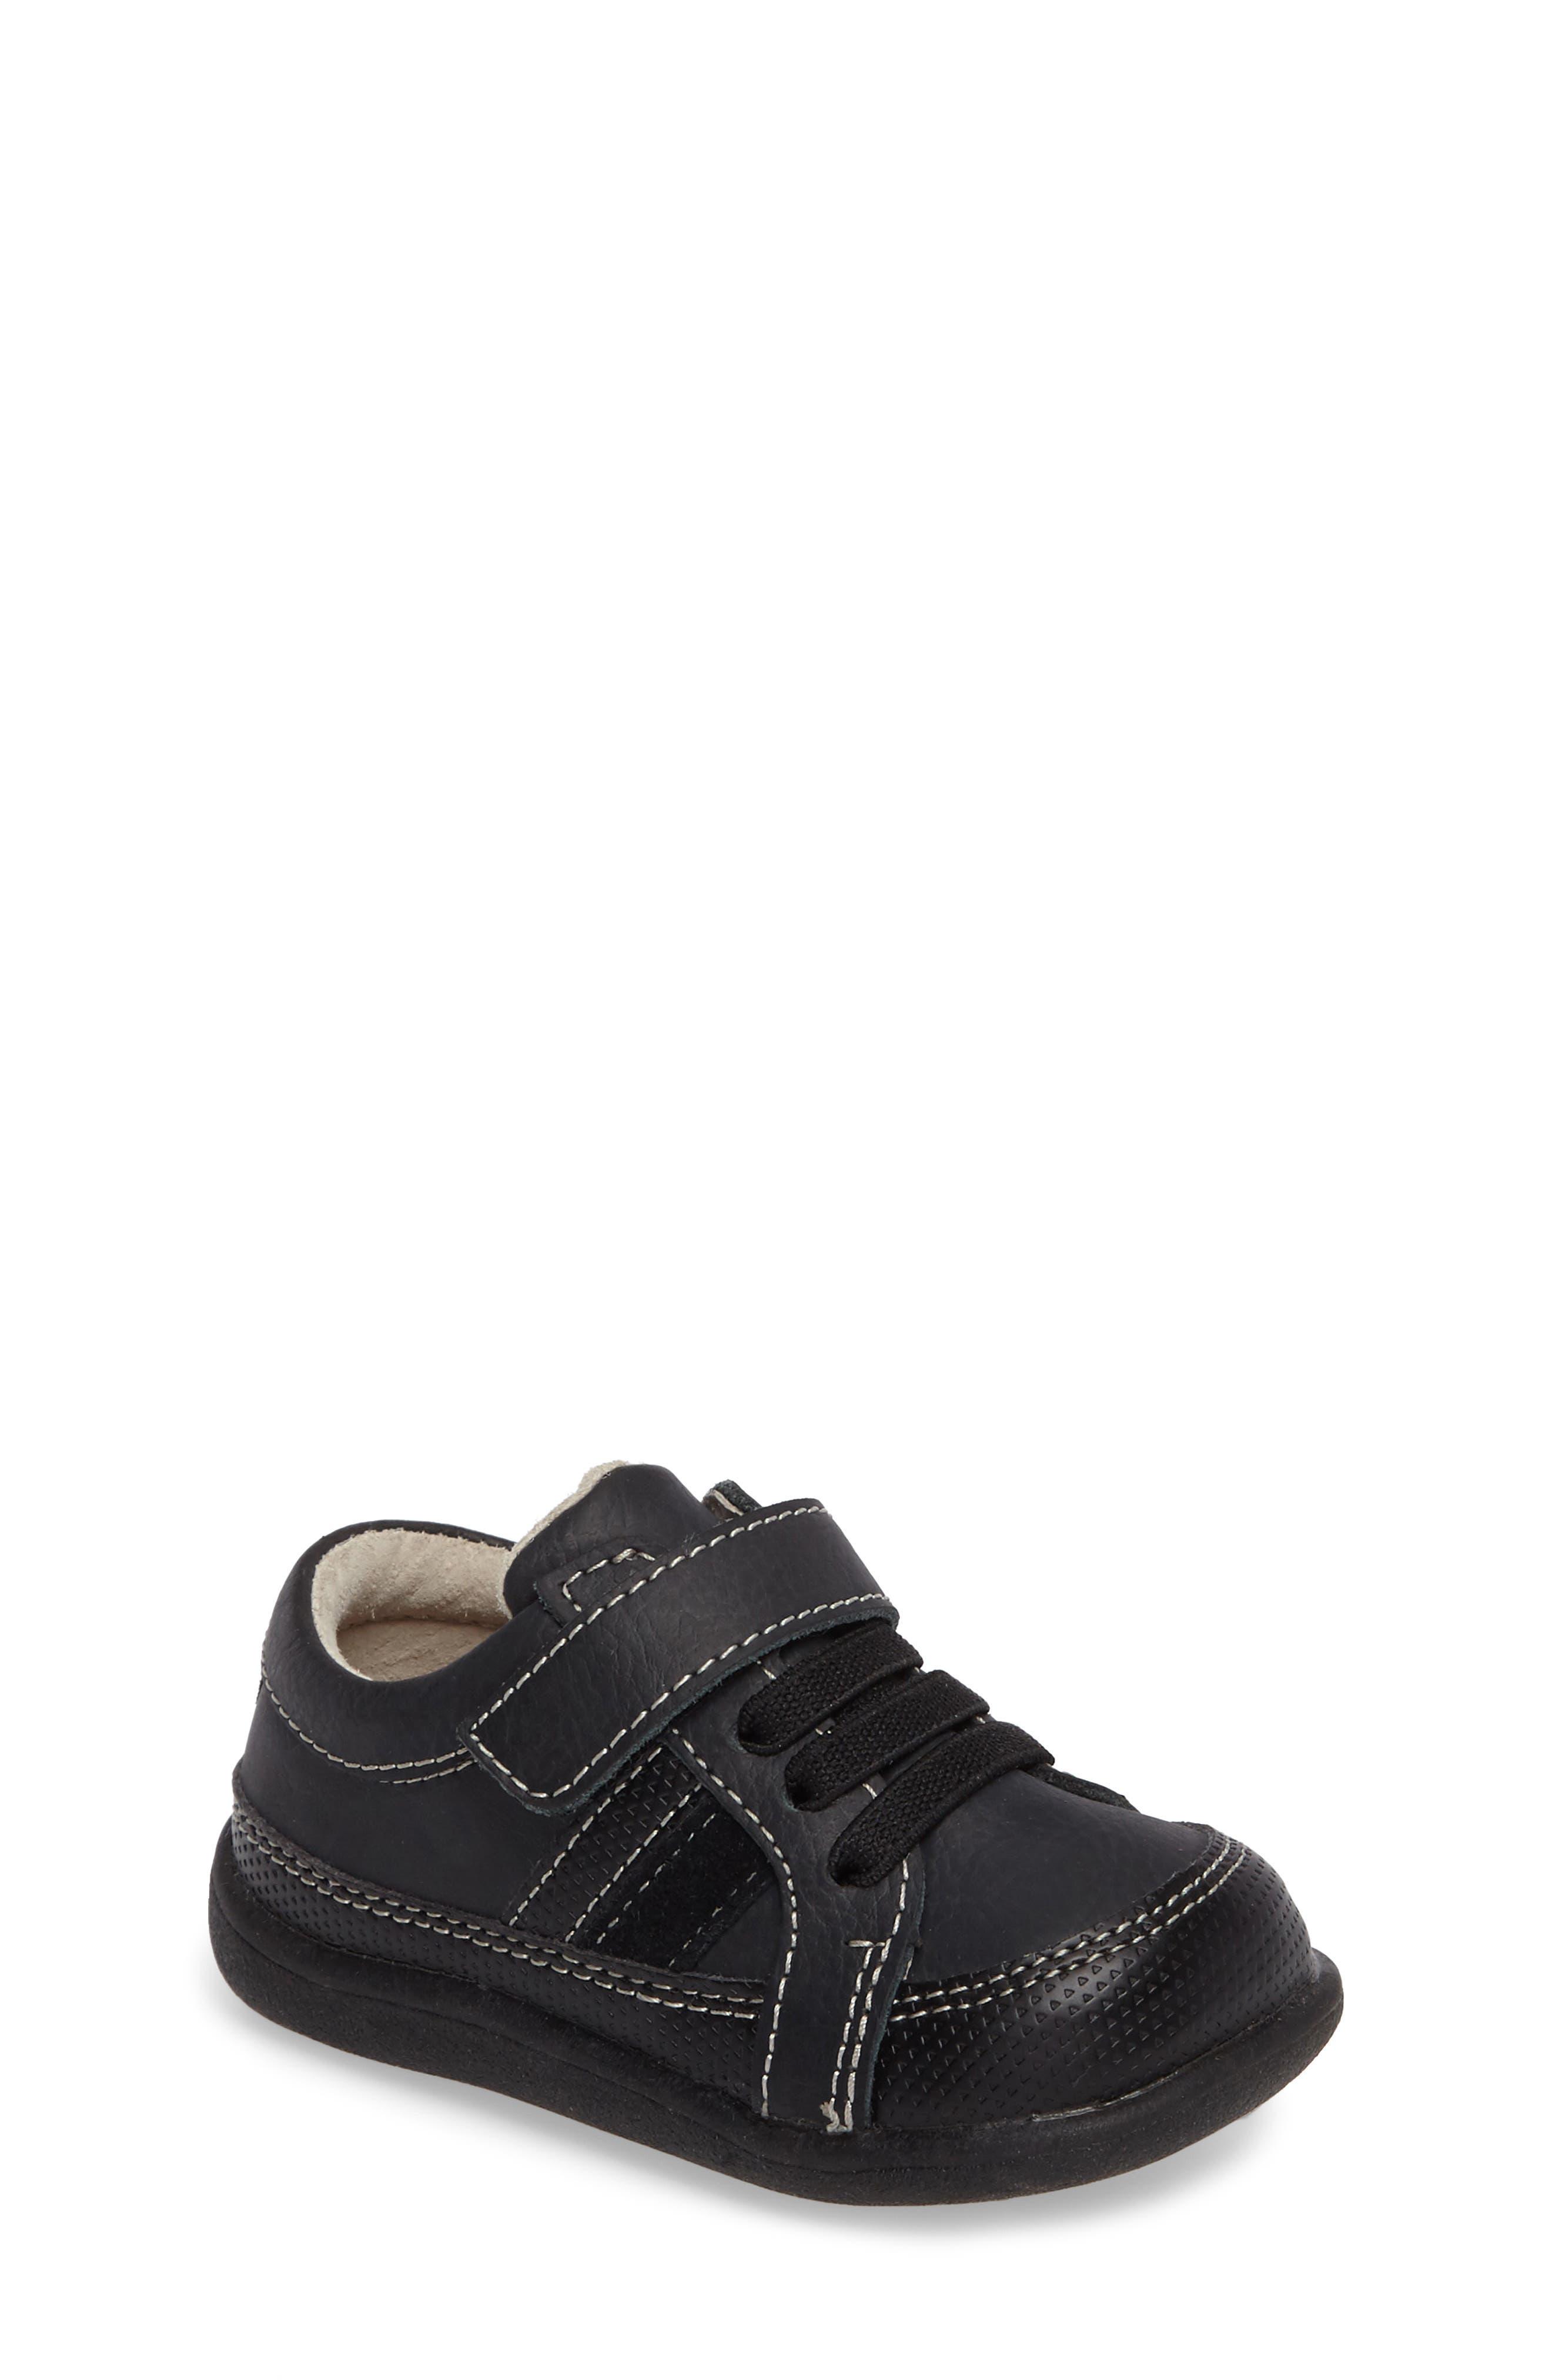 See Kai Run Randall II Sneaker (Baby, Walker, Toddler & Little Kid)